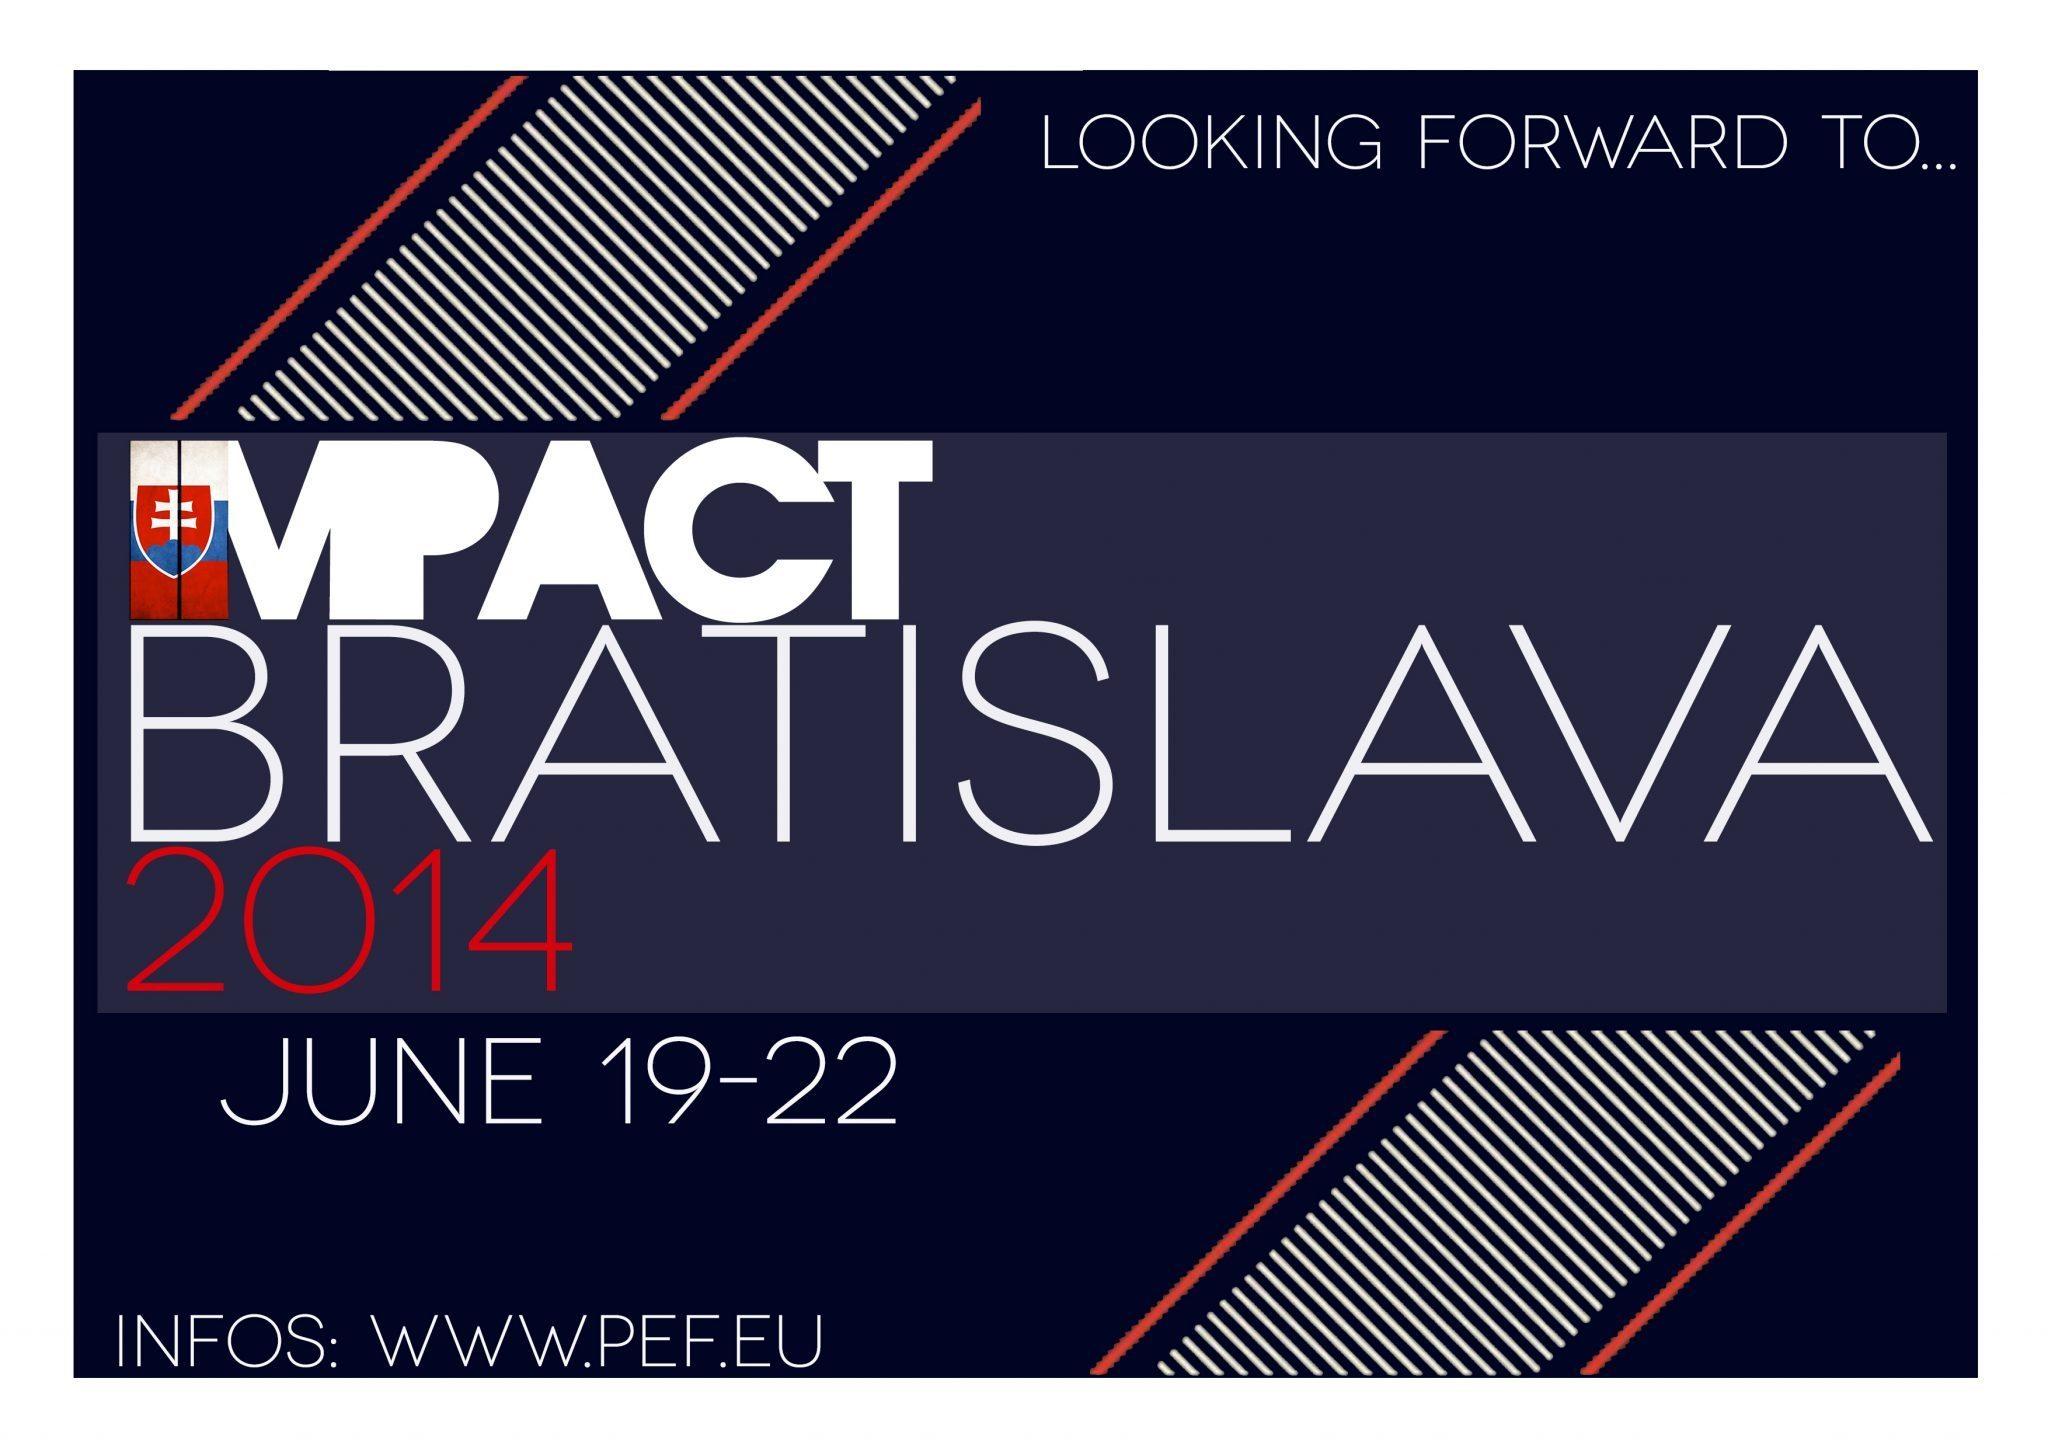 Impact Bratislava